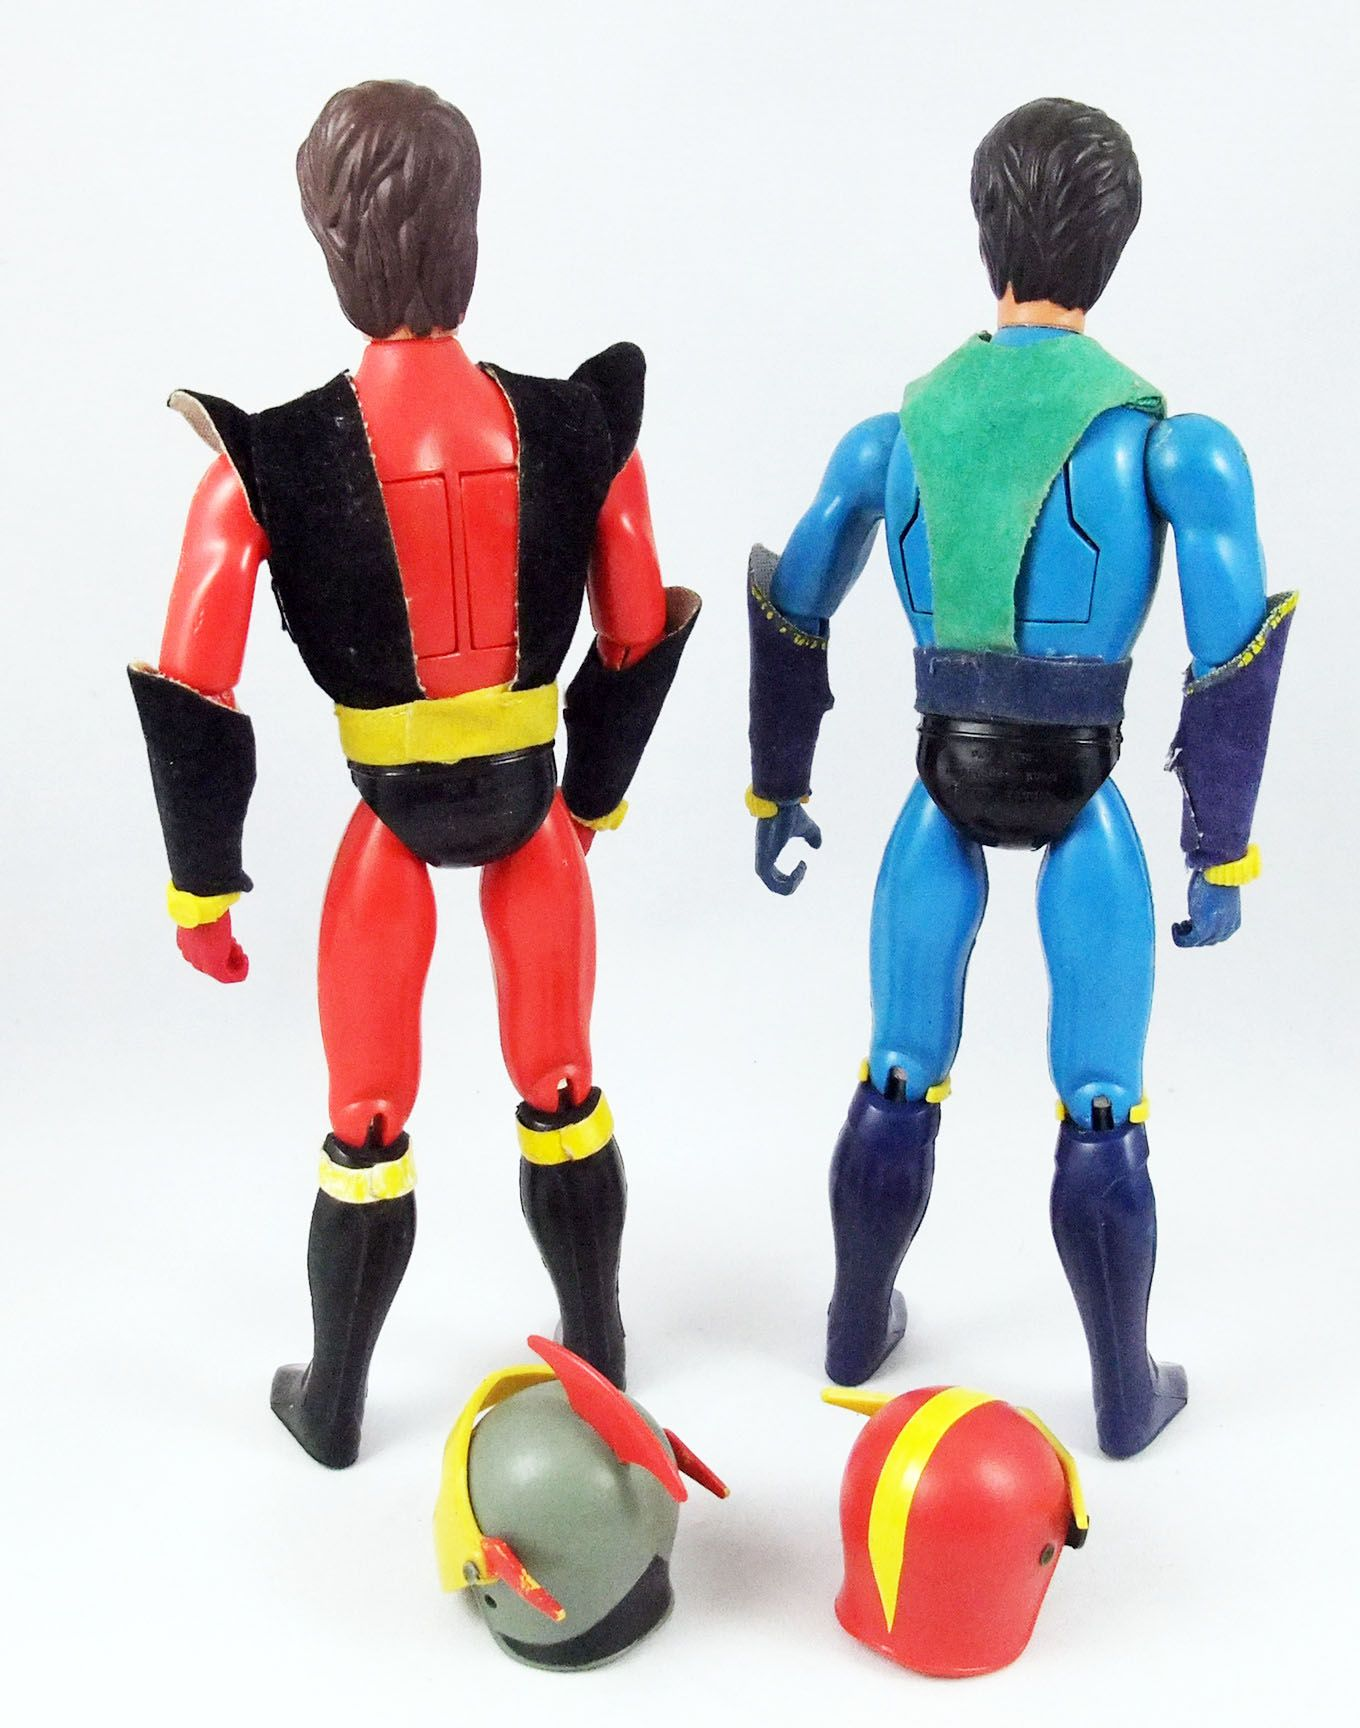 Goldorak - Ceji Arbois - Actarus & Alcor (Duke Fleed & Koji Kabuto) - Figurines articulées 20cm (loose)